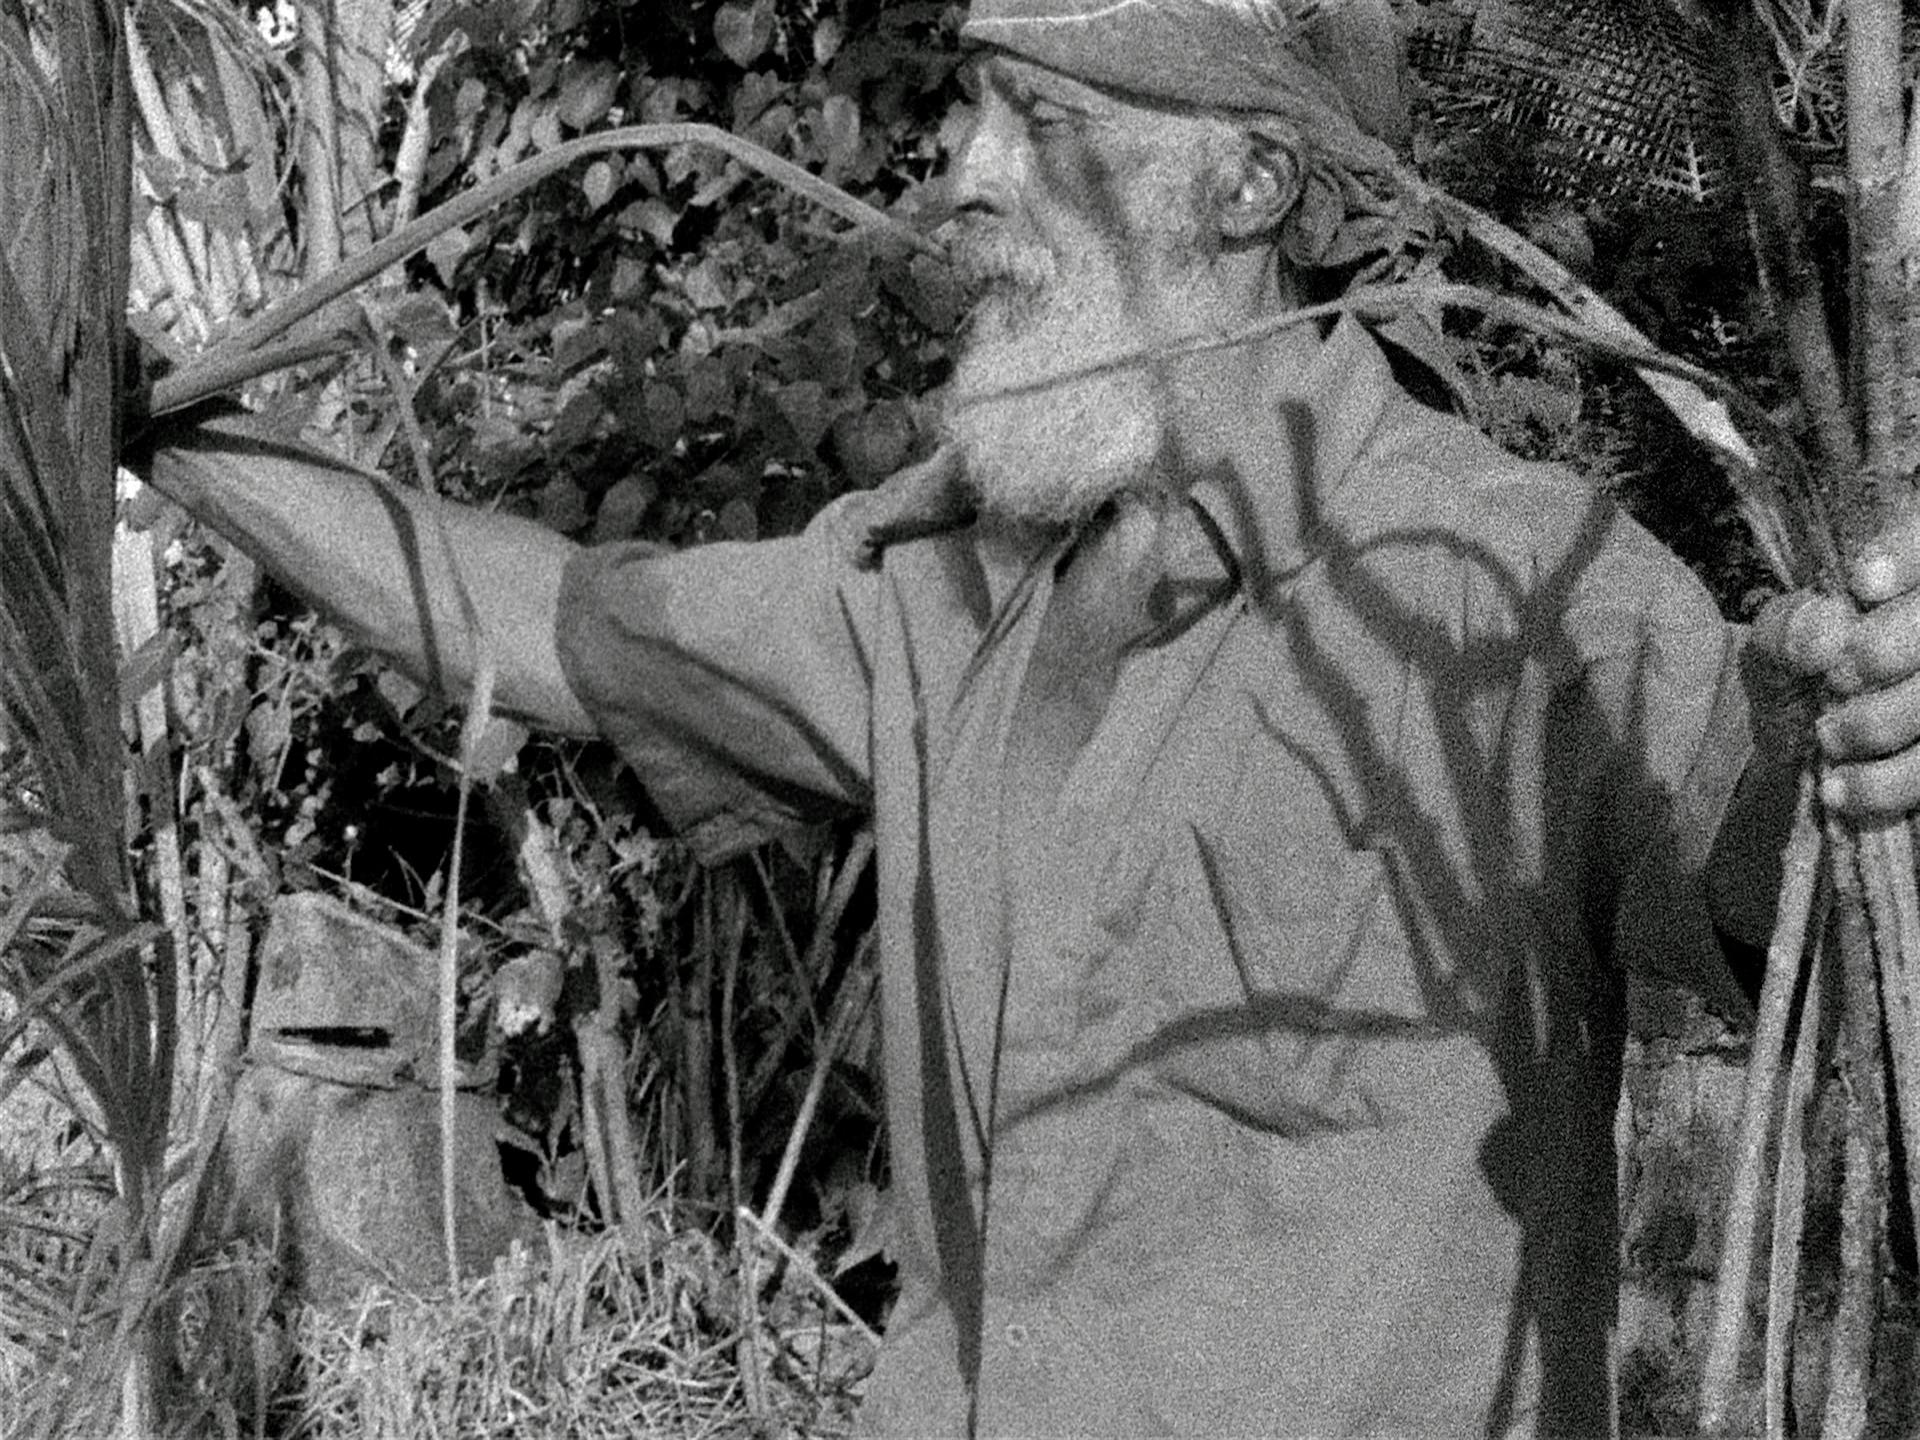 Beatriz Santiago Muñoz, Black Beach/Horse/Camp/The Dead/Forces, 2016 (still). 16mm film, sound, black and white; 8 min. Courtesy the artist and Galería Agustina Ferreyra